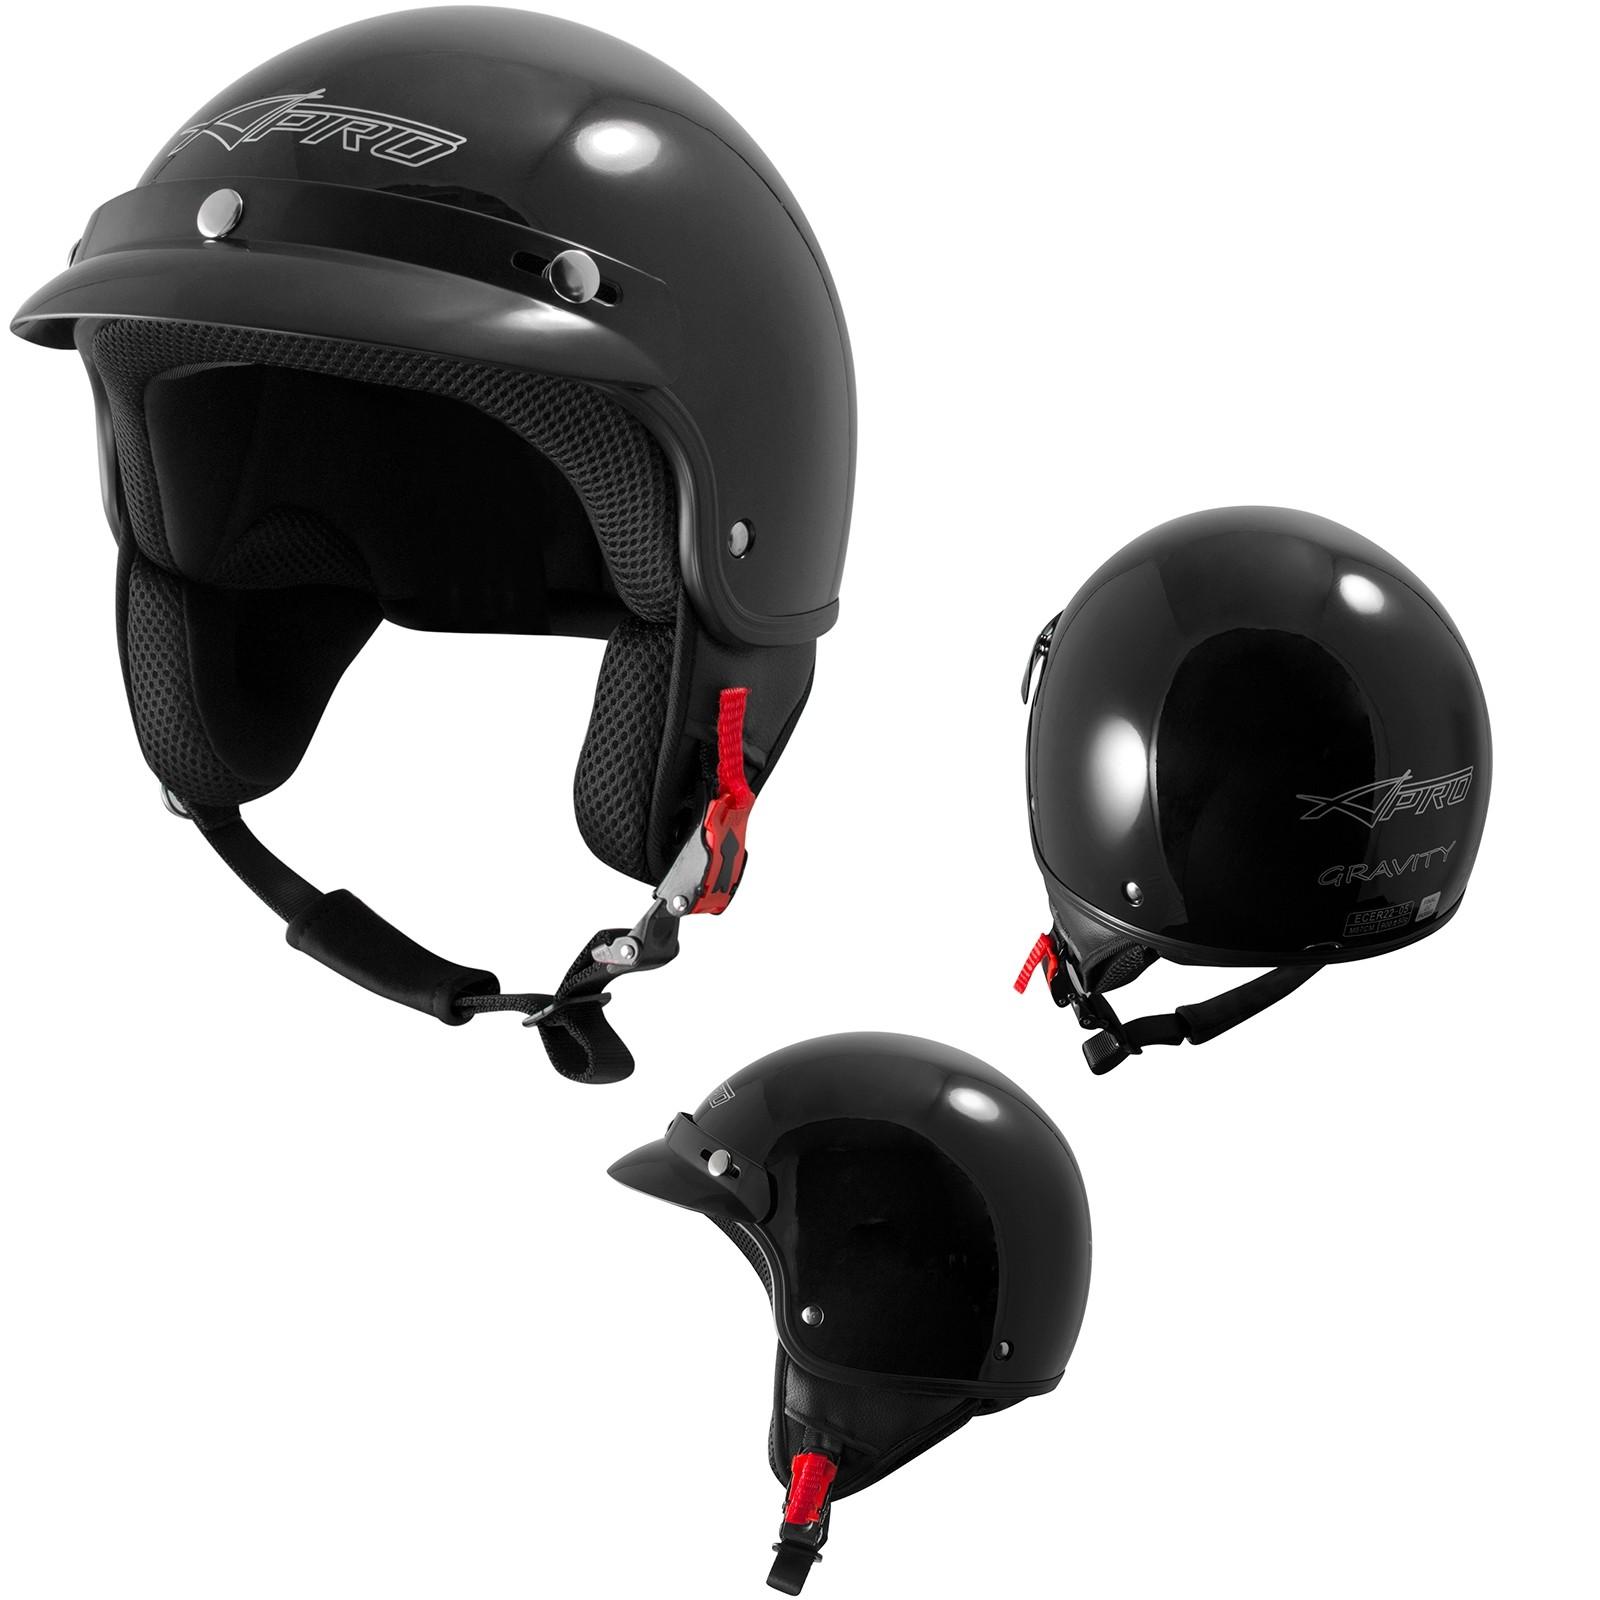 Gravity-Casco-Jet-Helmet-Motorcycle-Nero-Black-Sonic-Moto-A-Pro-Set